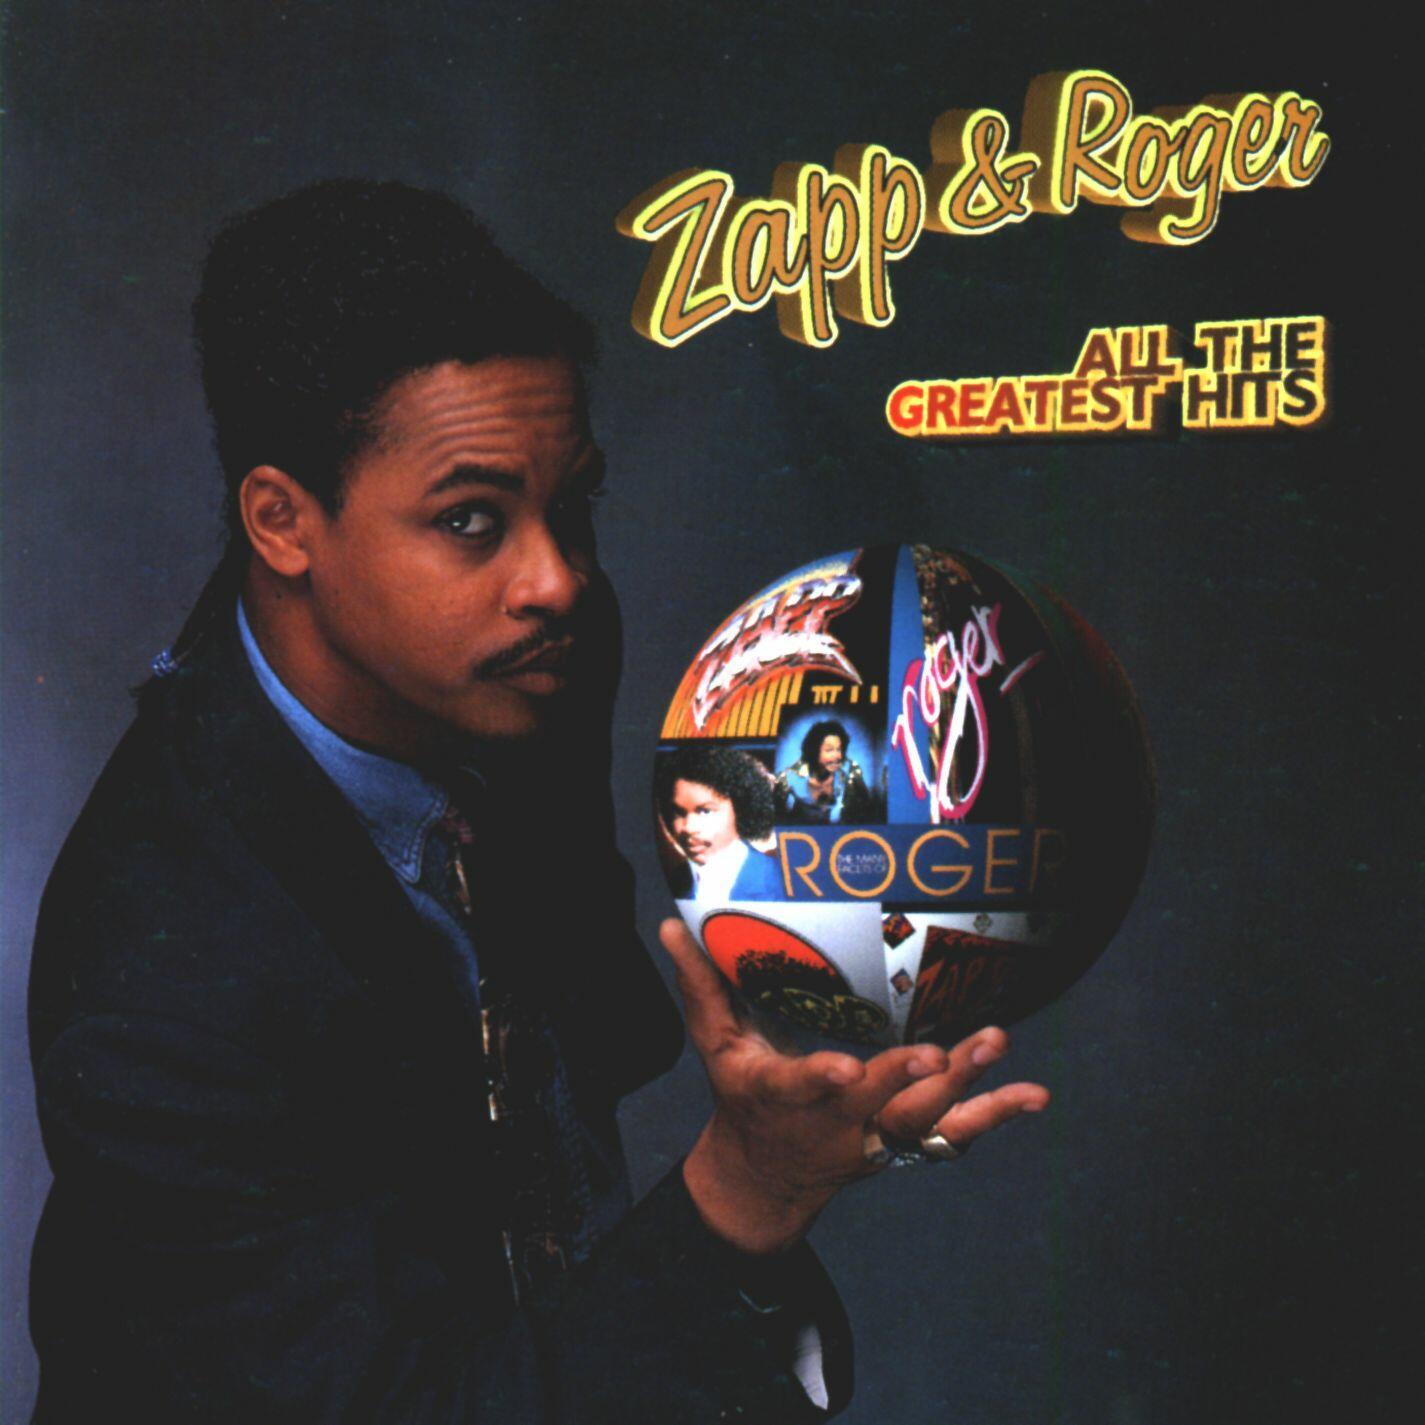 Listen free to zapp & roger computer love radio | iheartradio.